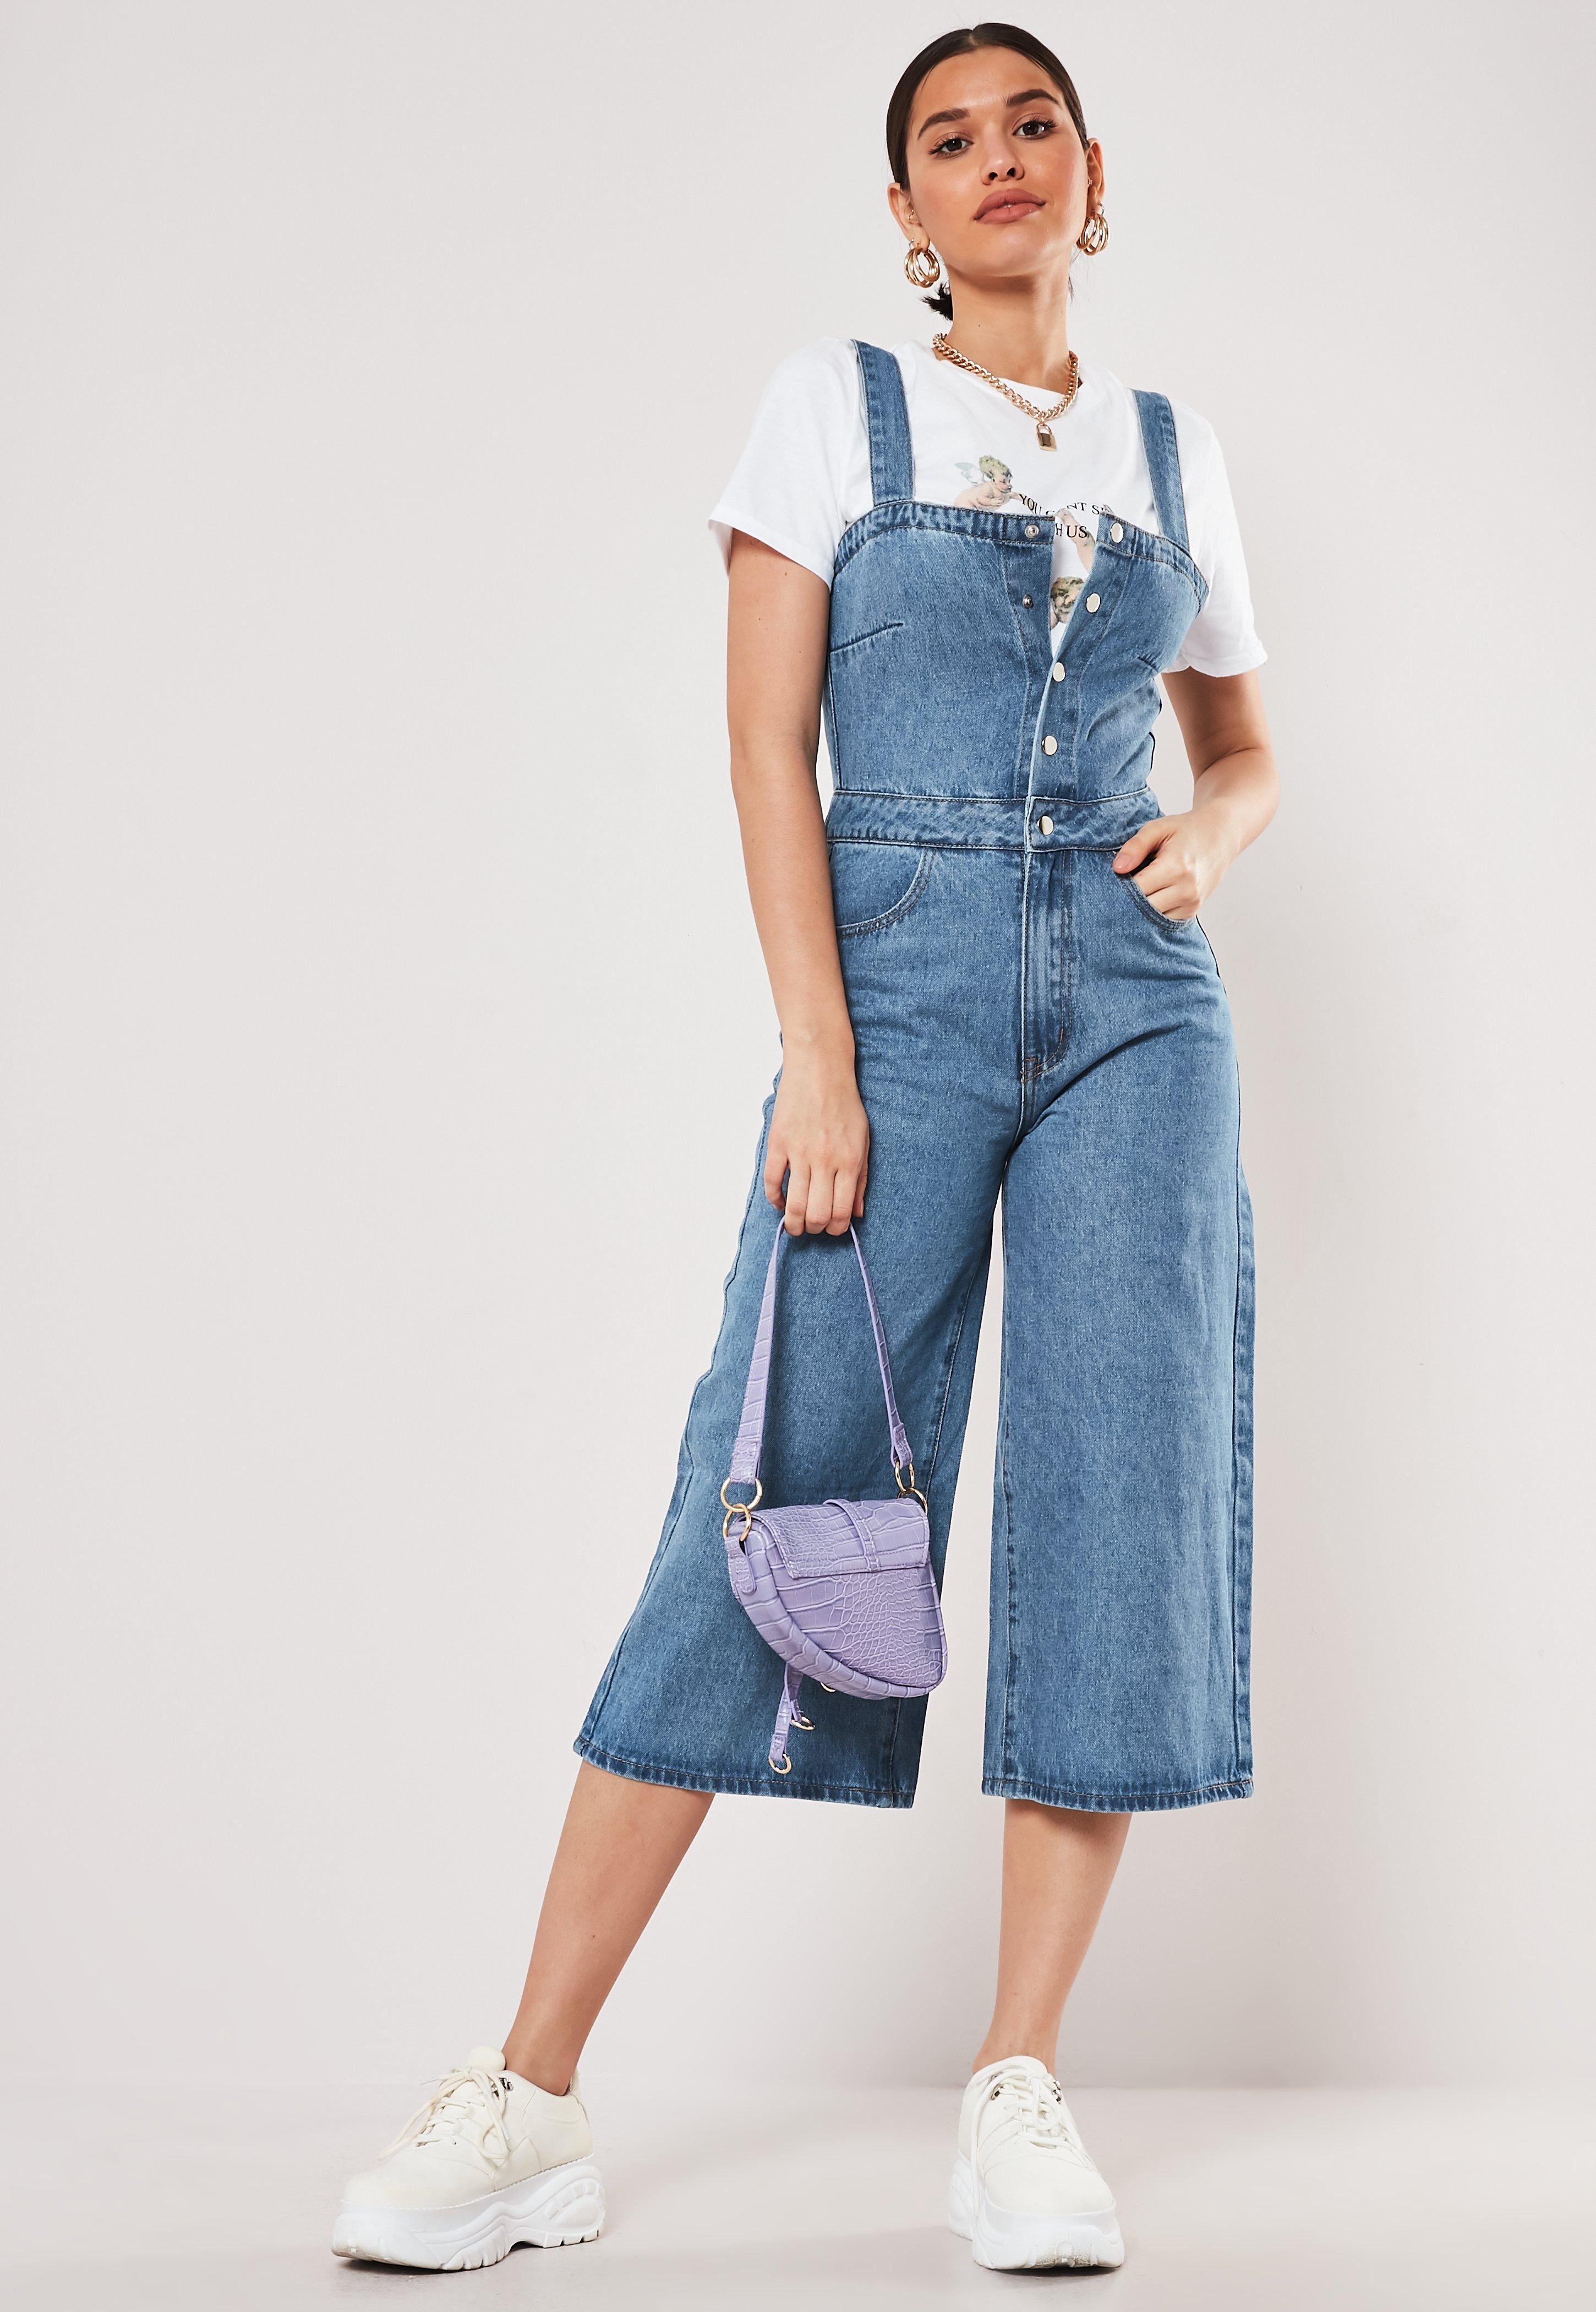 Bleu Combinaison Culotte Combinaison Culotte En Jeans PlkTOuZwXi